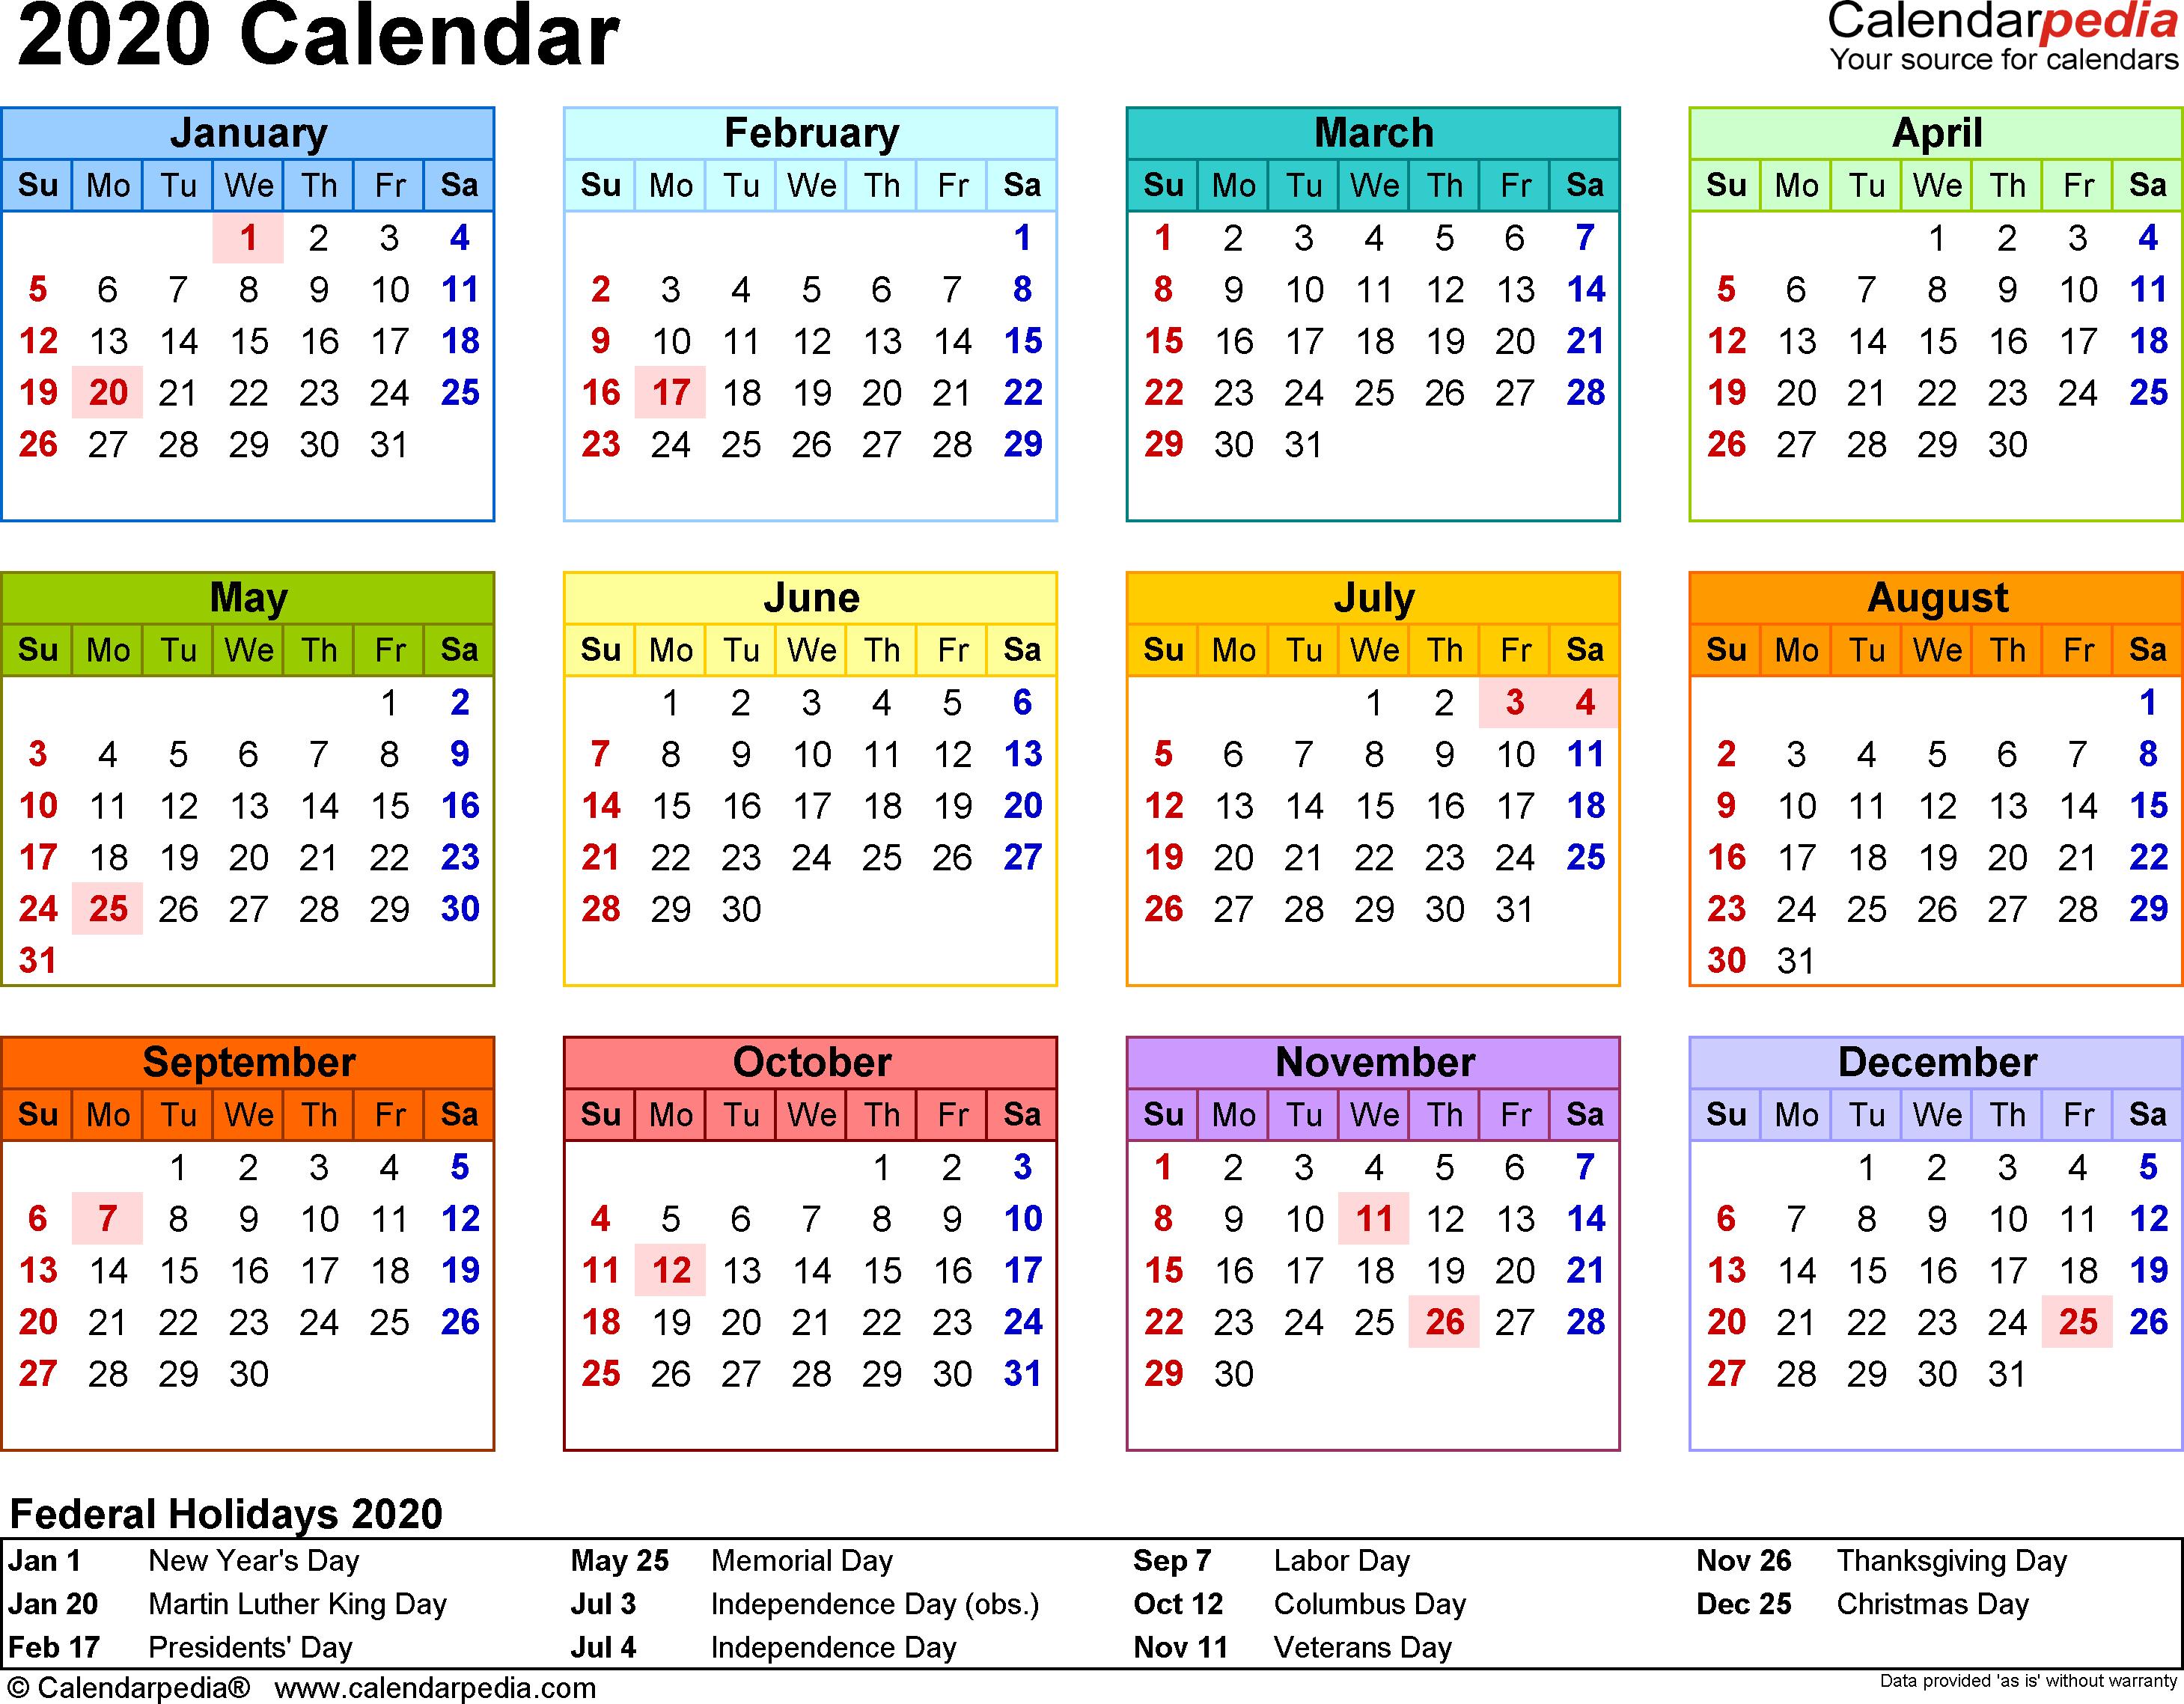 Employee Data Calendar May 2020-2021 | Calendar Template within Excel 2021 Calendar Drop Down